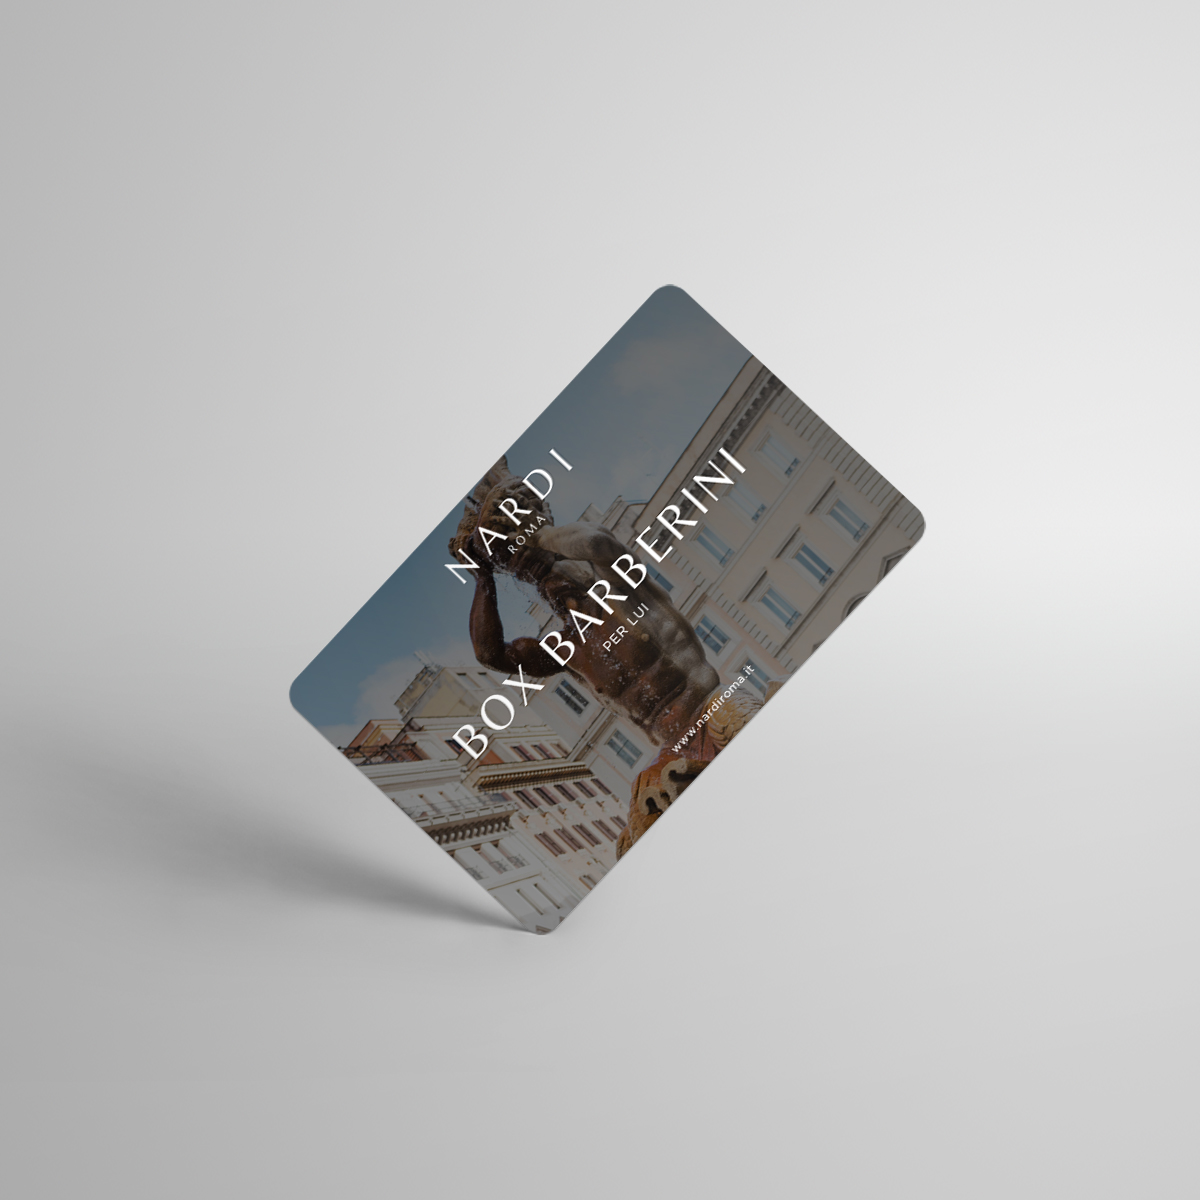 Box Barberini Card Nardi Roma Shop per lui